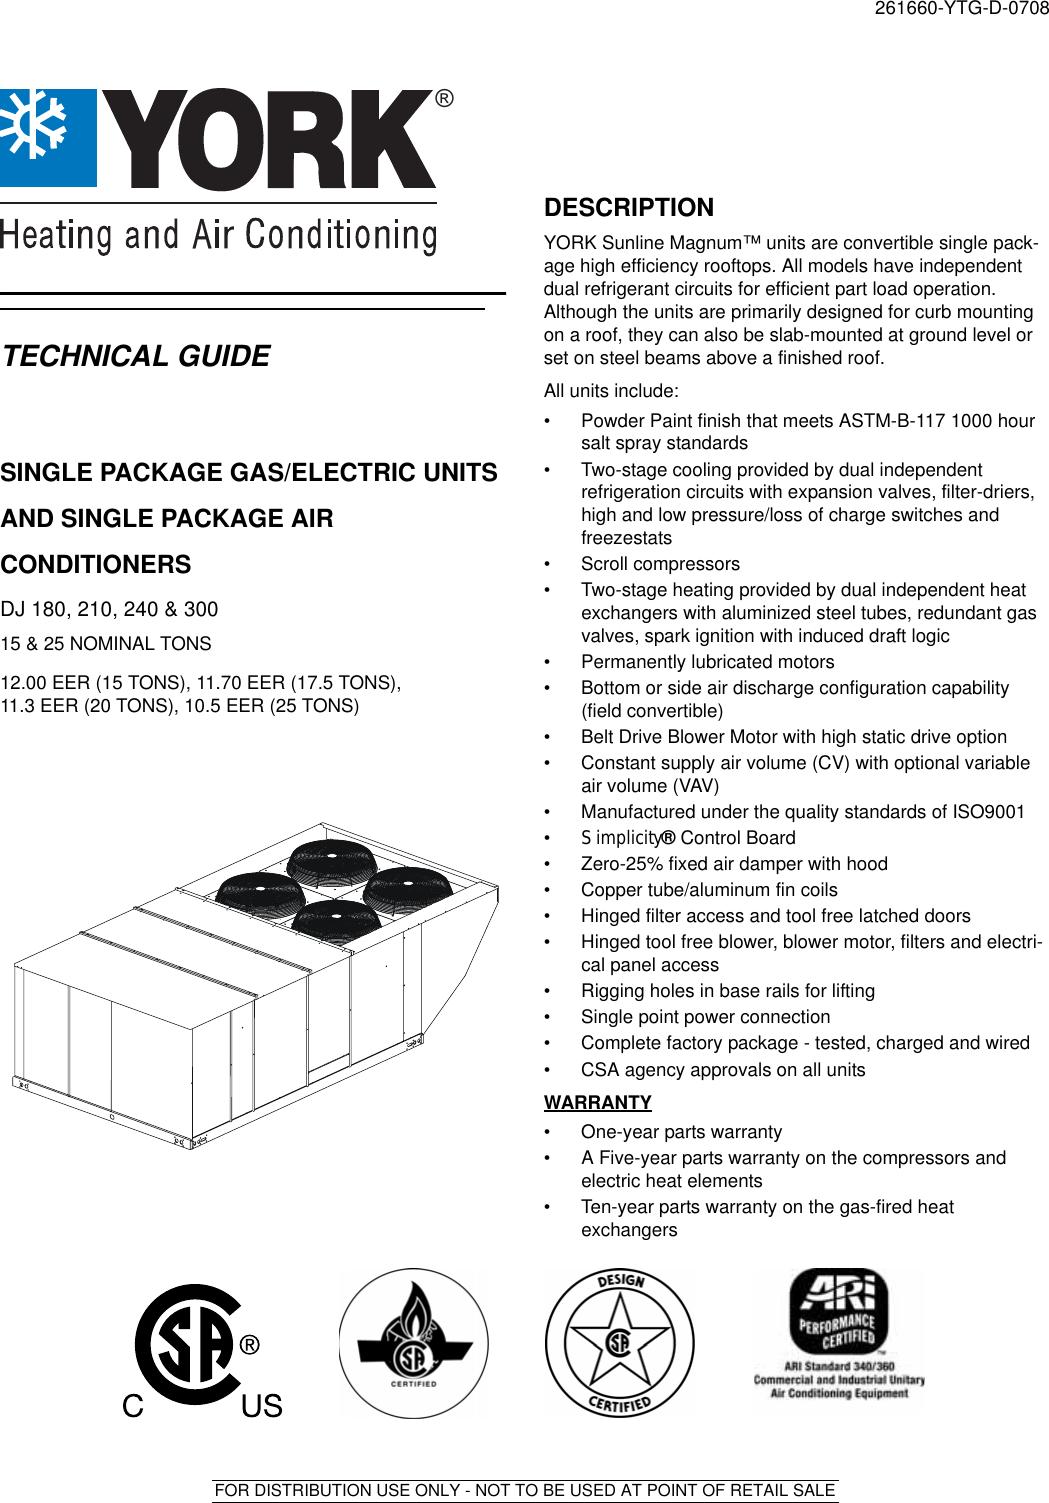 York Dj 300 Users Manual Y Tg Single Package Gas Elec